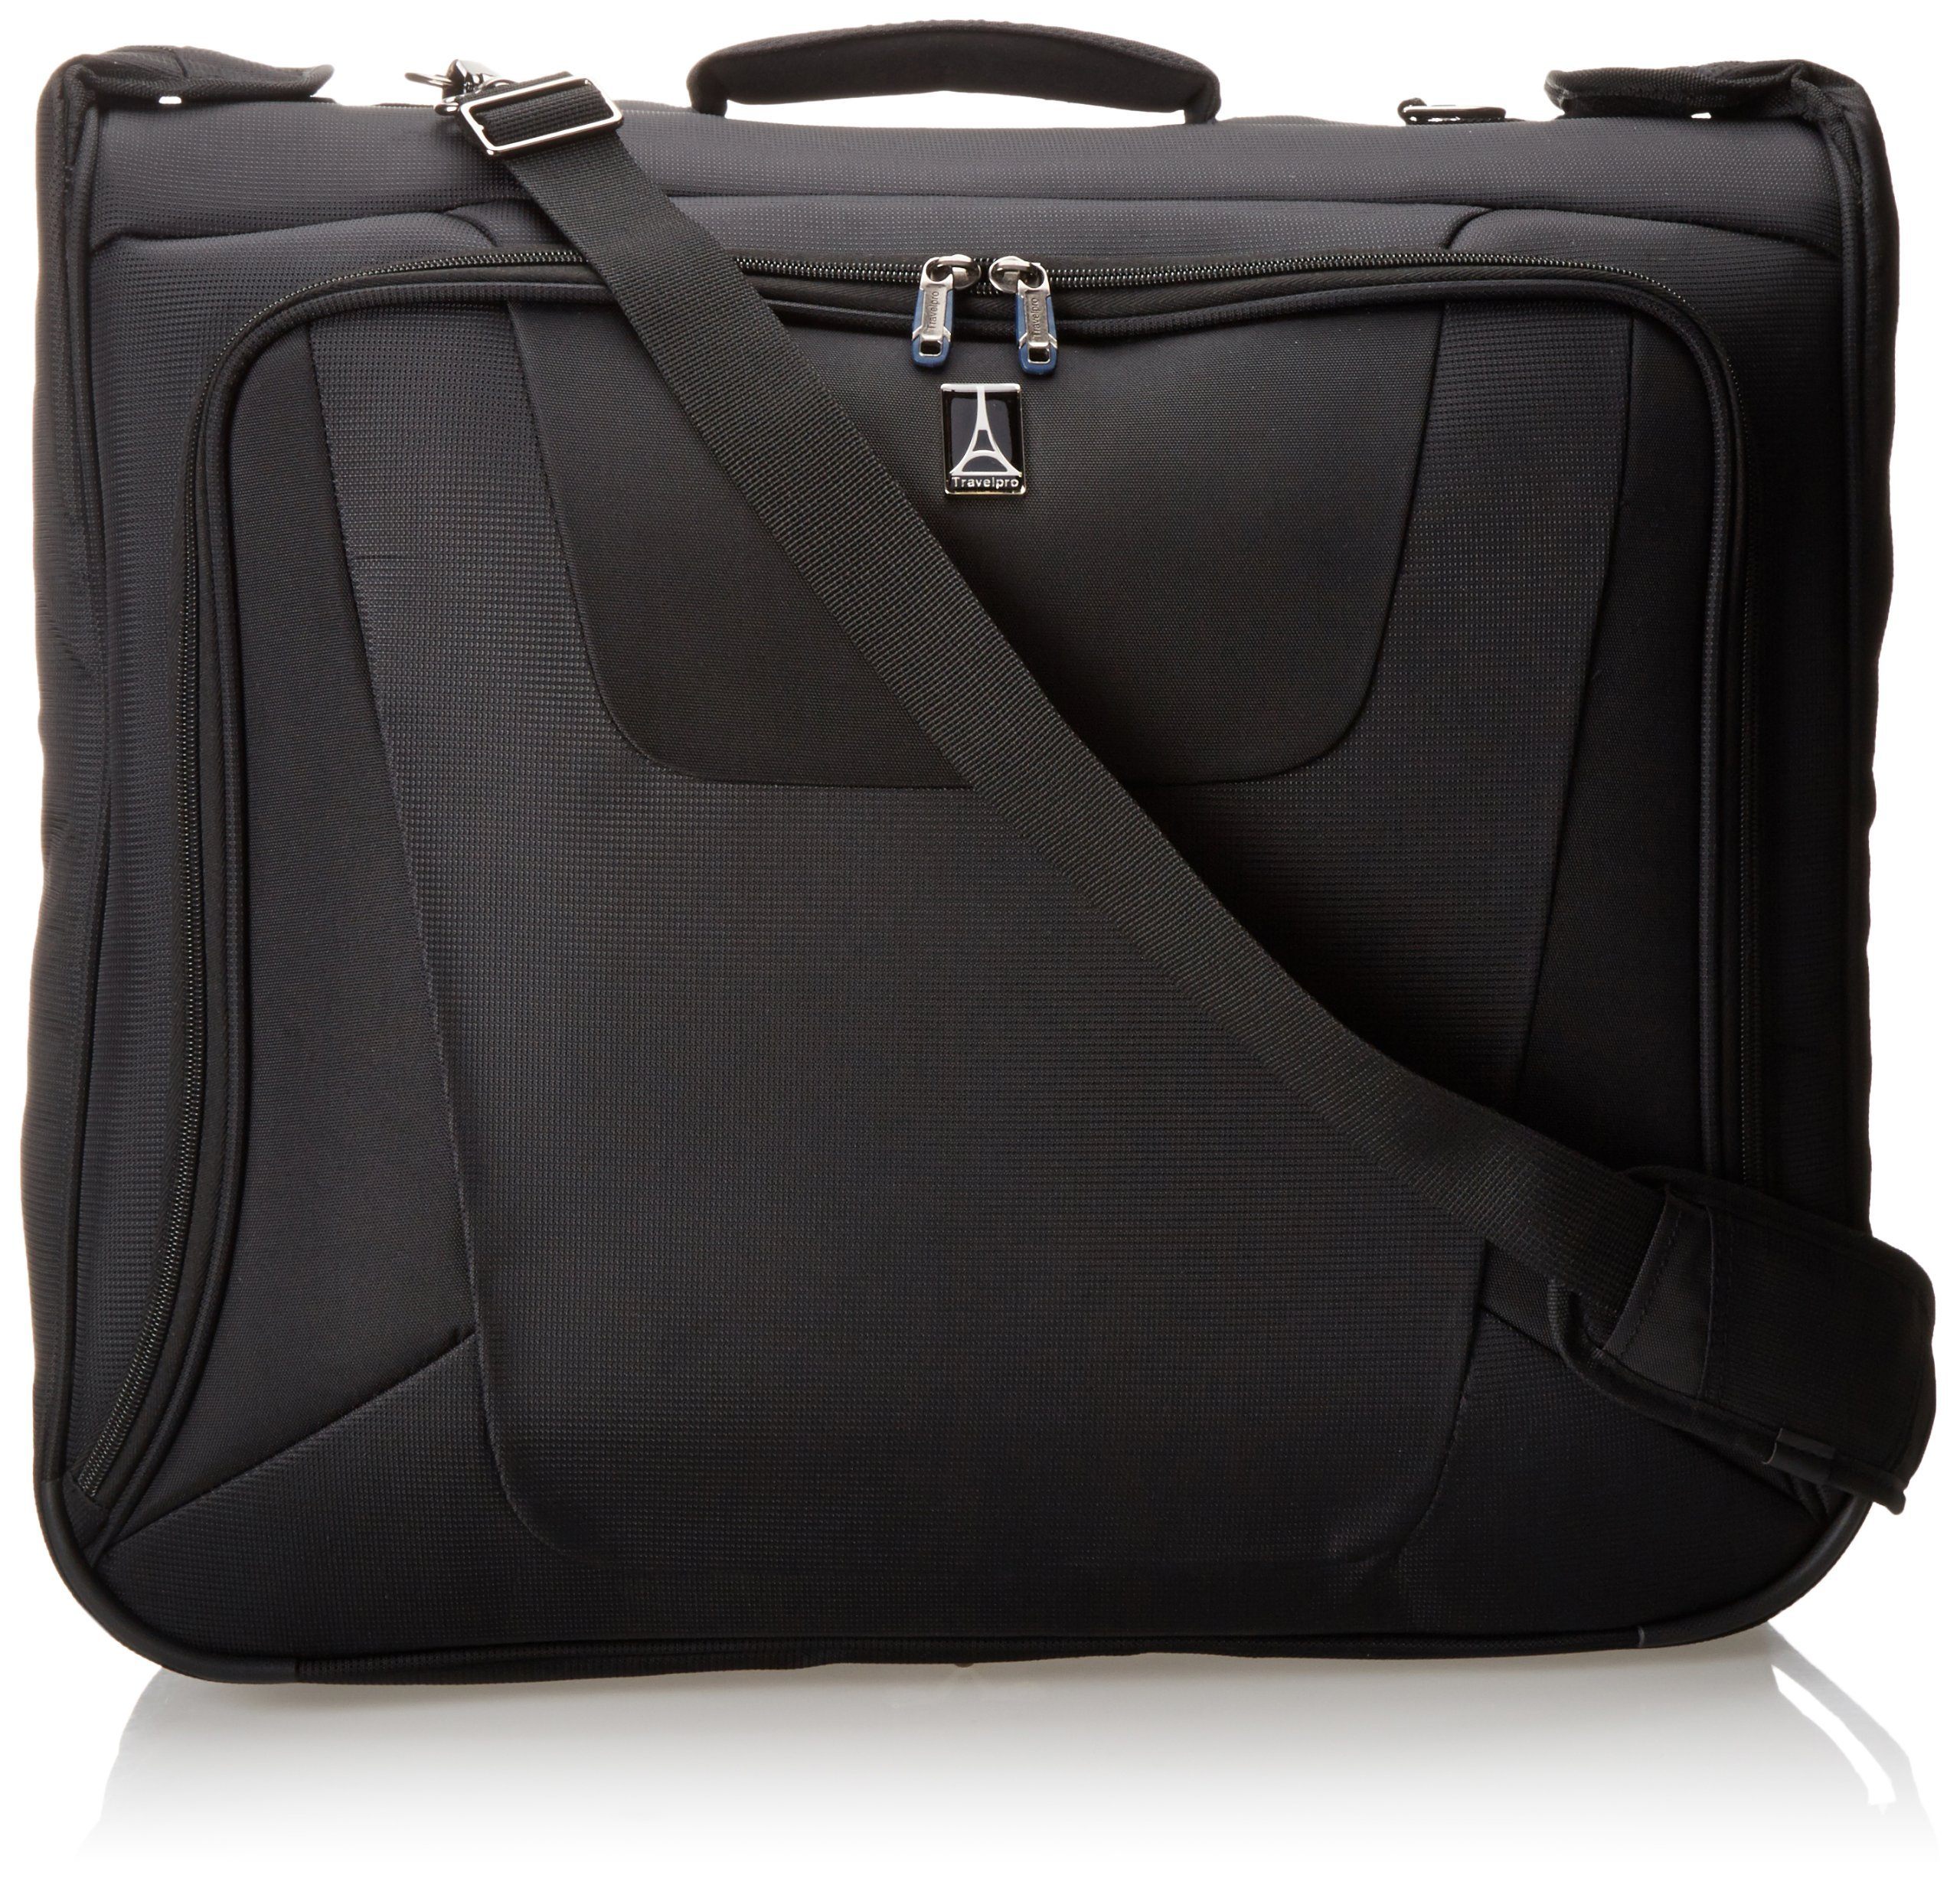 Travelpro Luggage Maxlite3 Garment Bag, Black, One Size